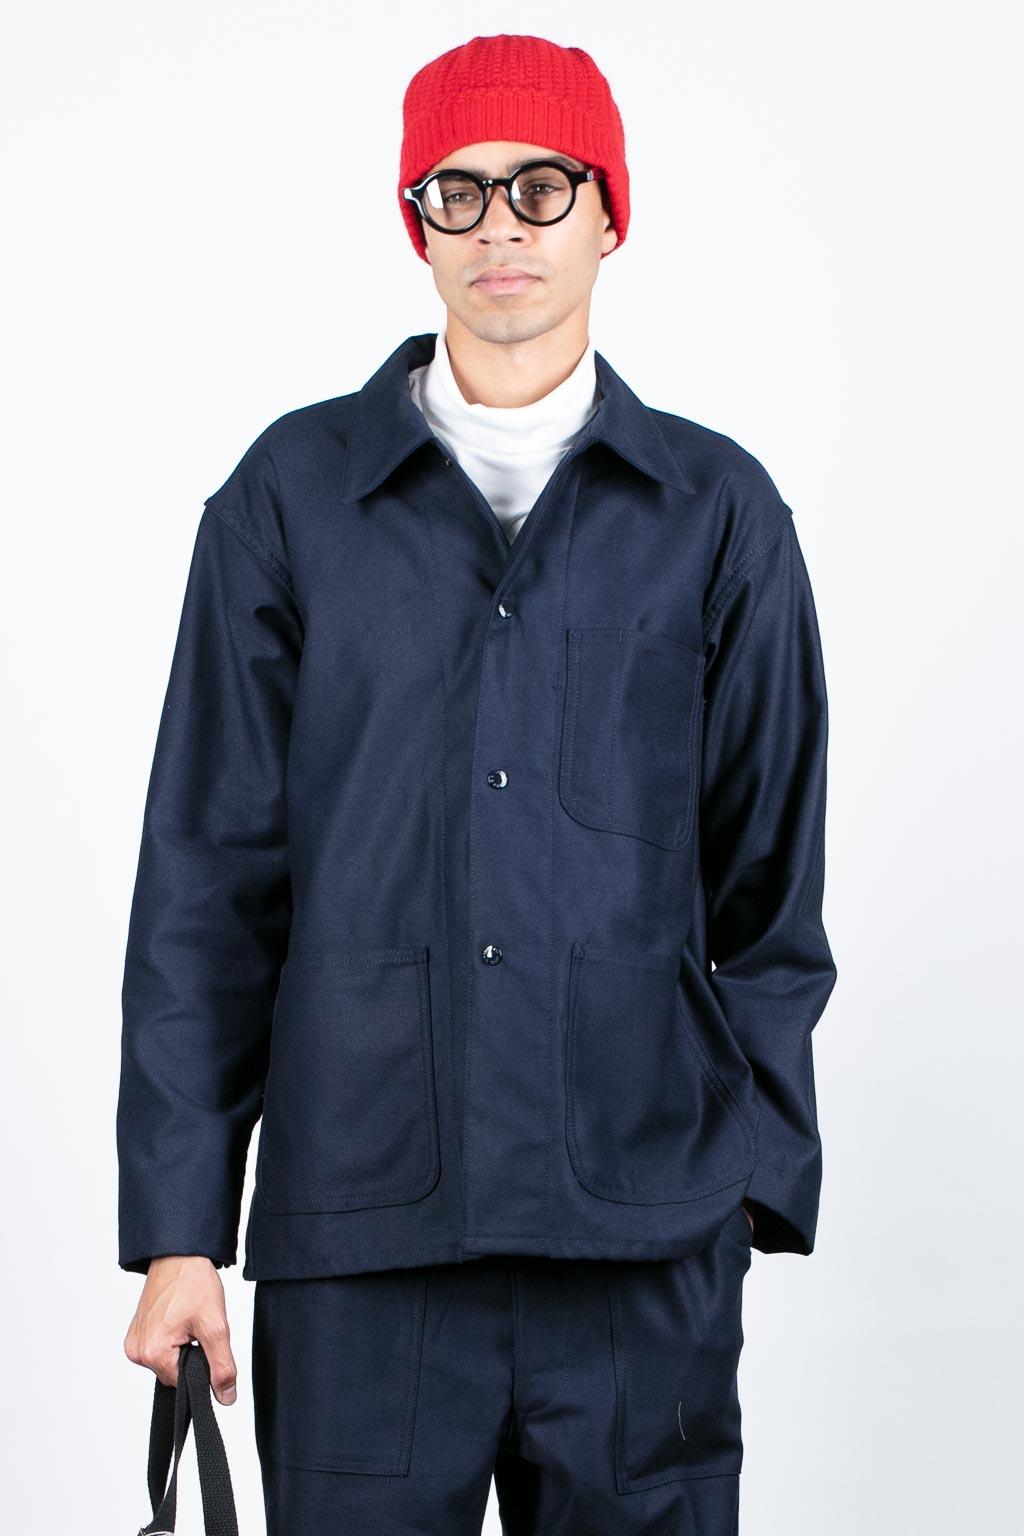 Bluebuttonshop Eg Workaday Eg Workaday Utility Jacket